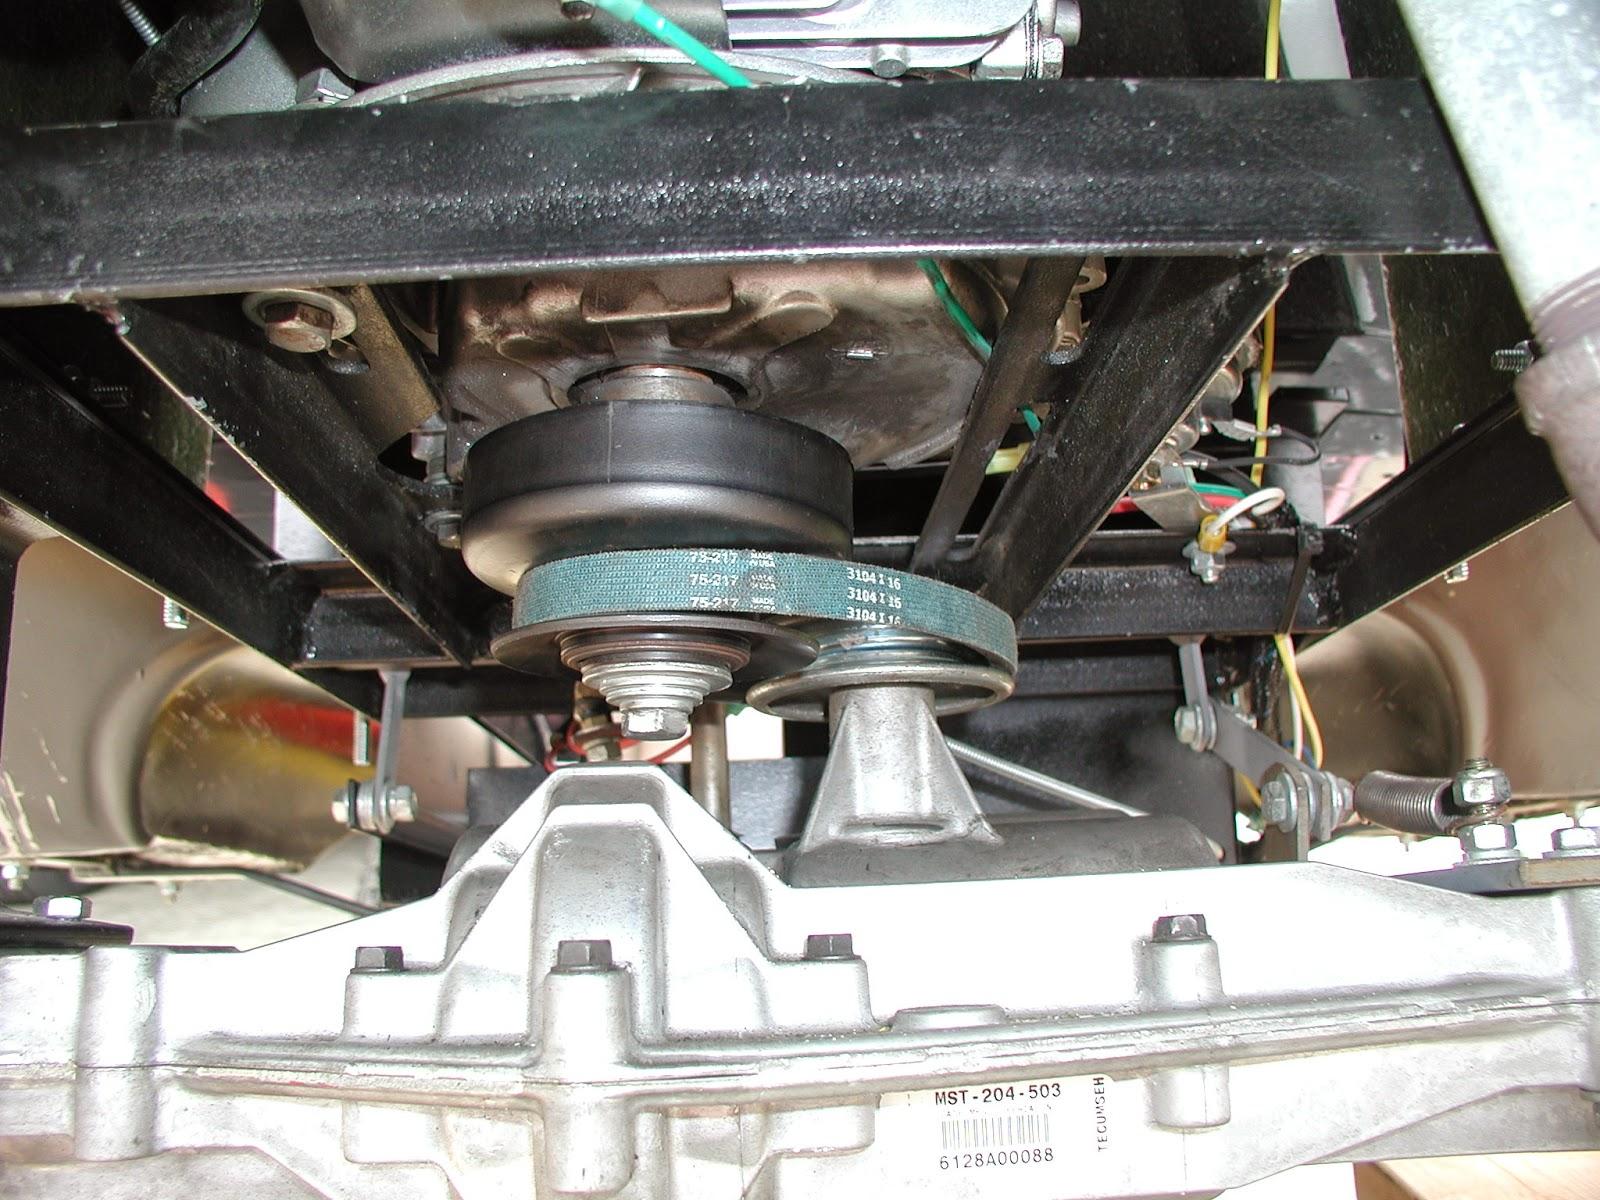 Centrifugal Clutch Tractor : Wally sue shriner car clutch repair